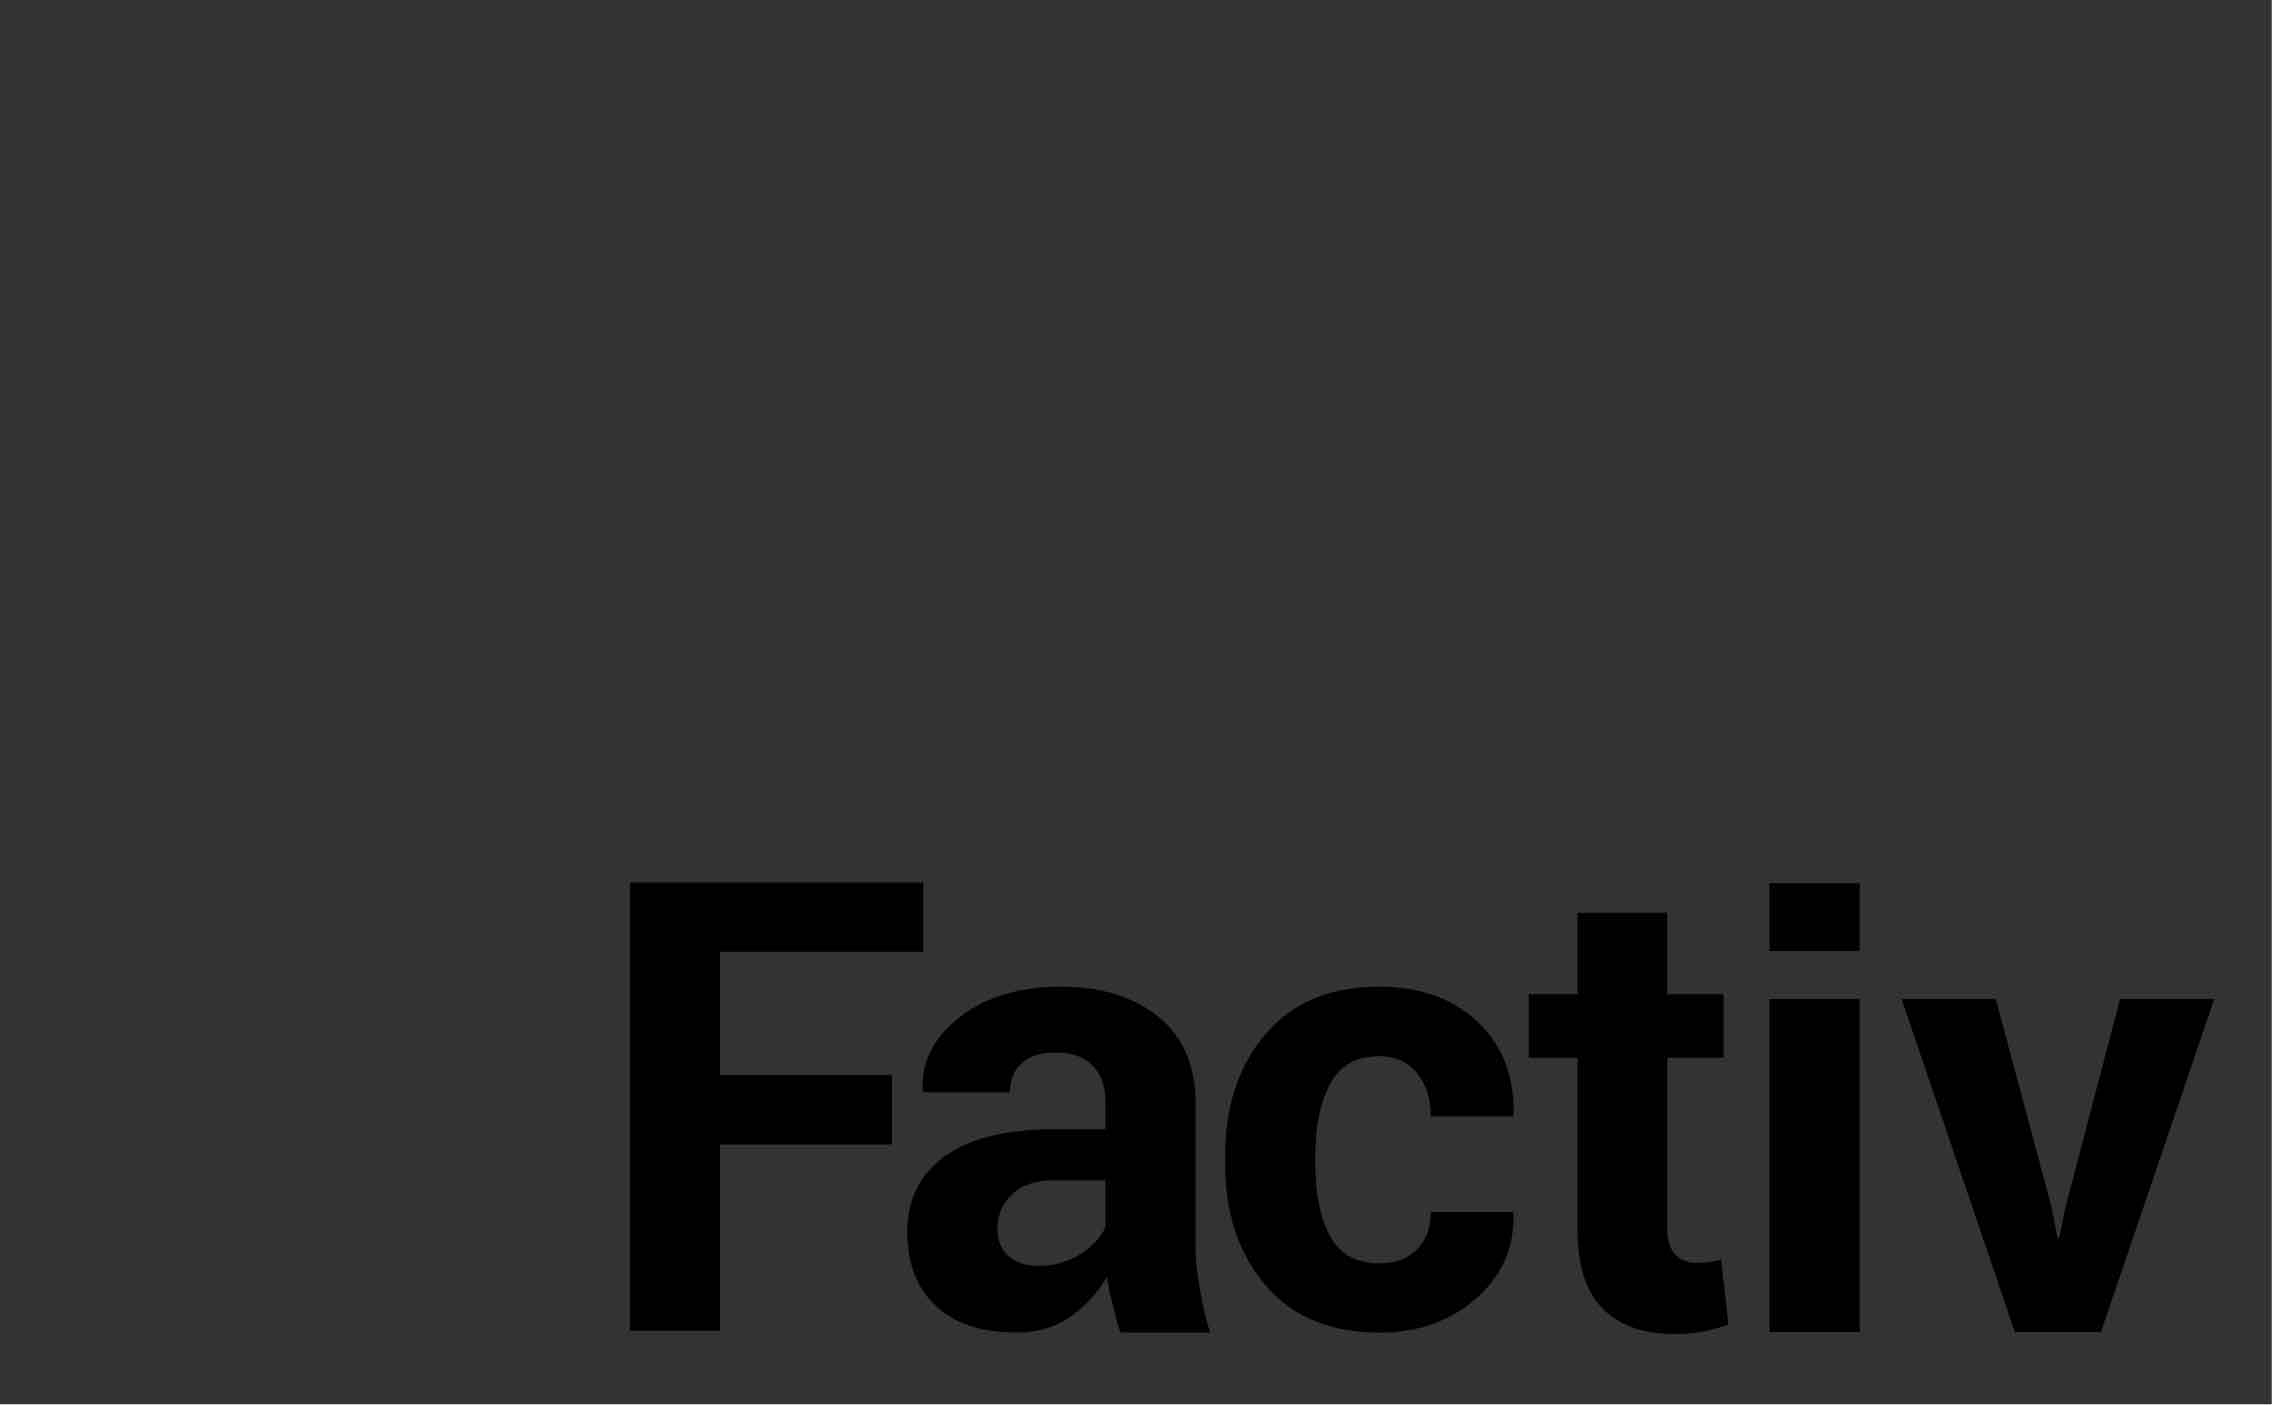 Factiv